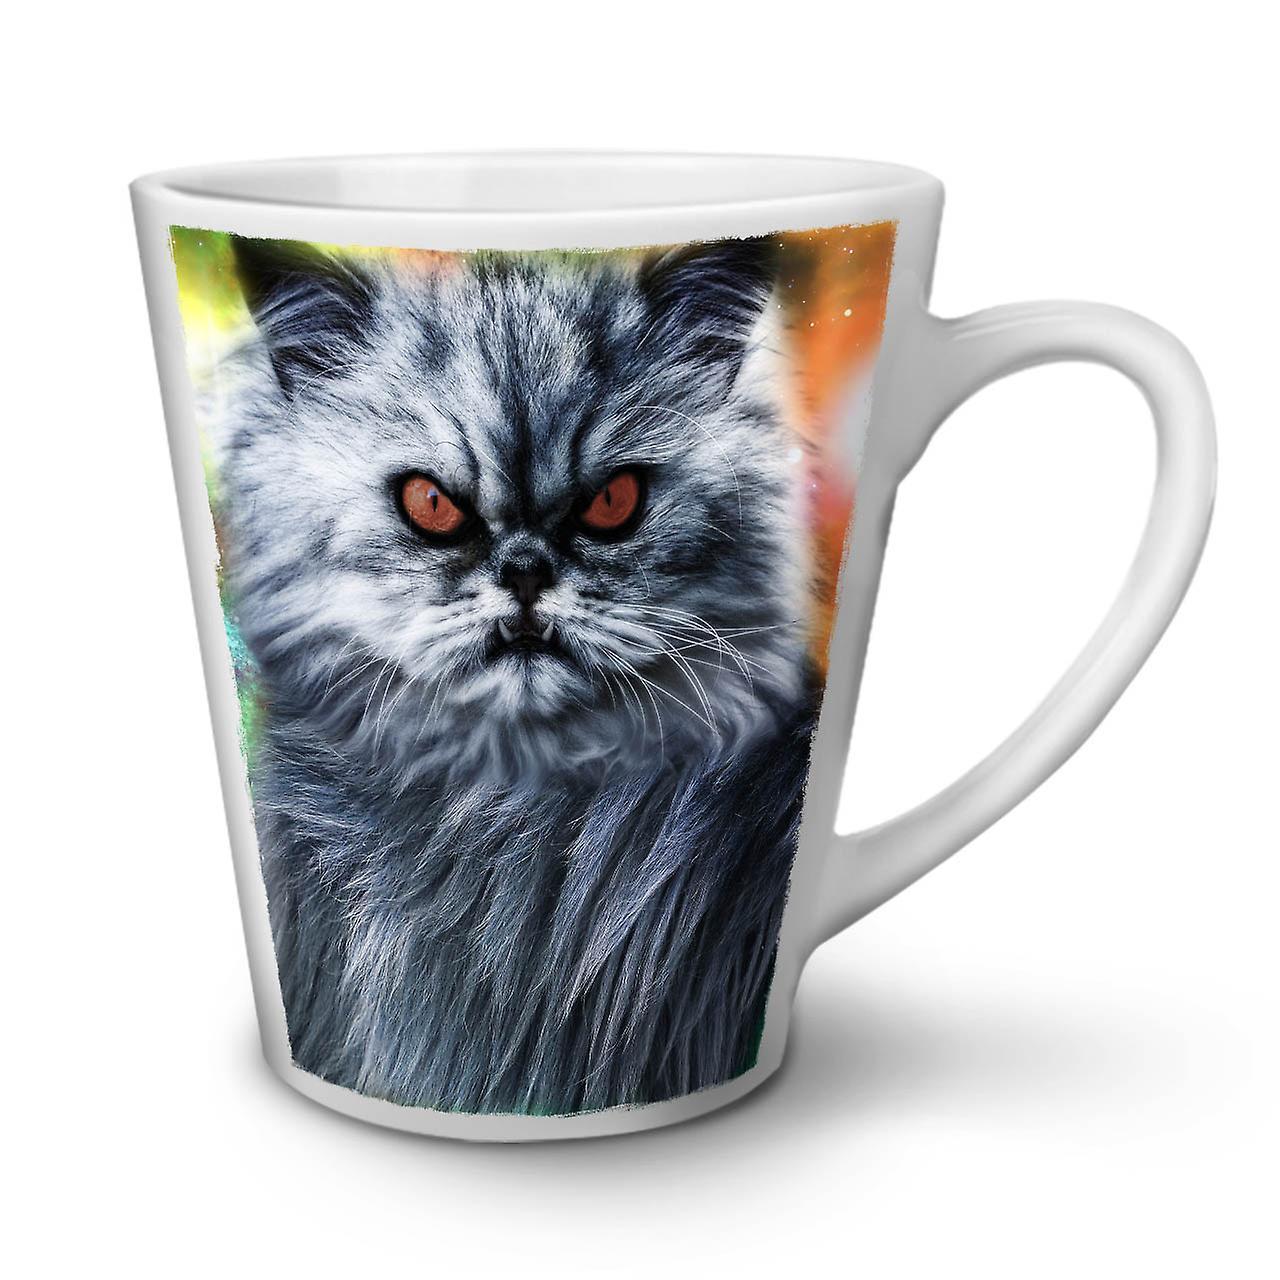 Mug Mauvais Café En Cat Œil Céramique 12 Angry Latte Thé Blanc Nouveau OzWellcoda WEIYe9H2Db